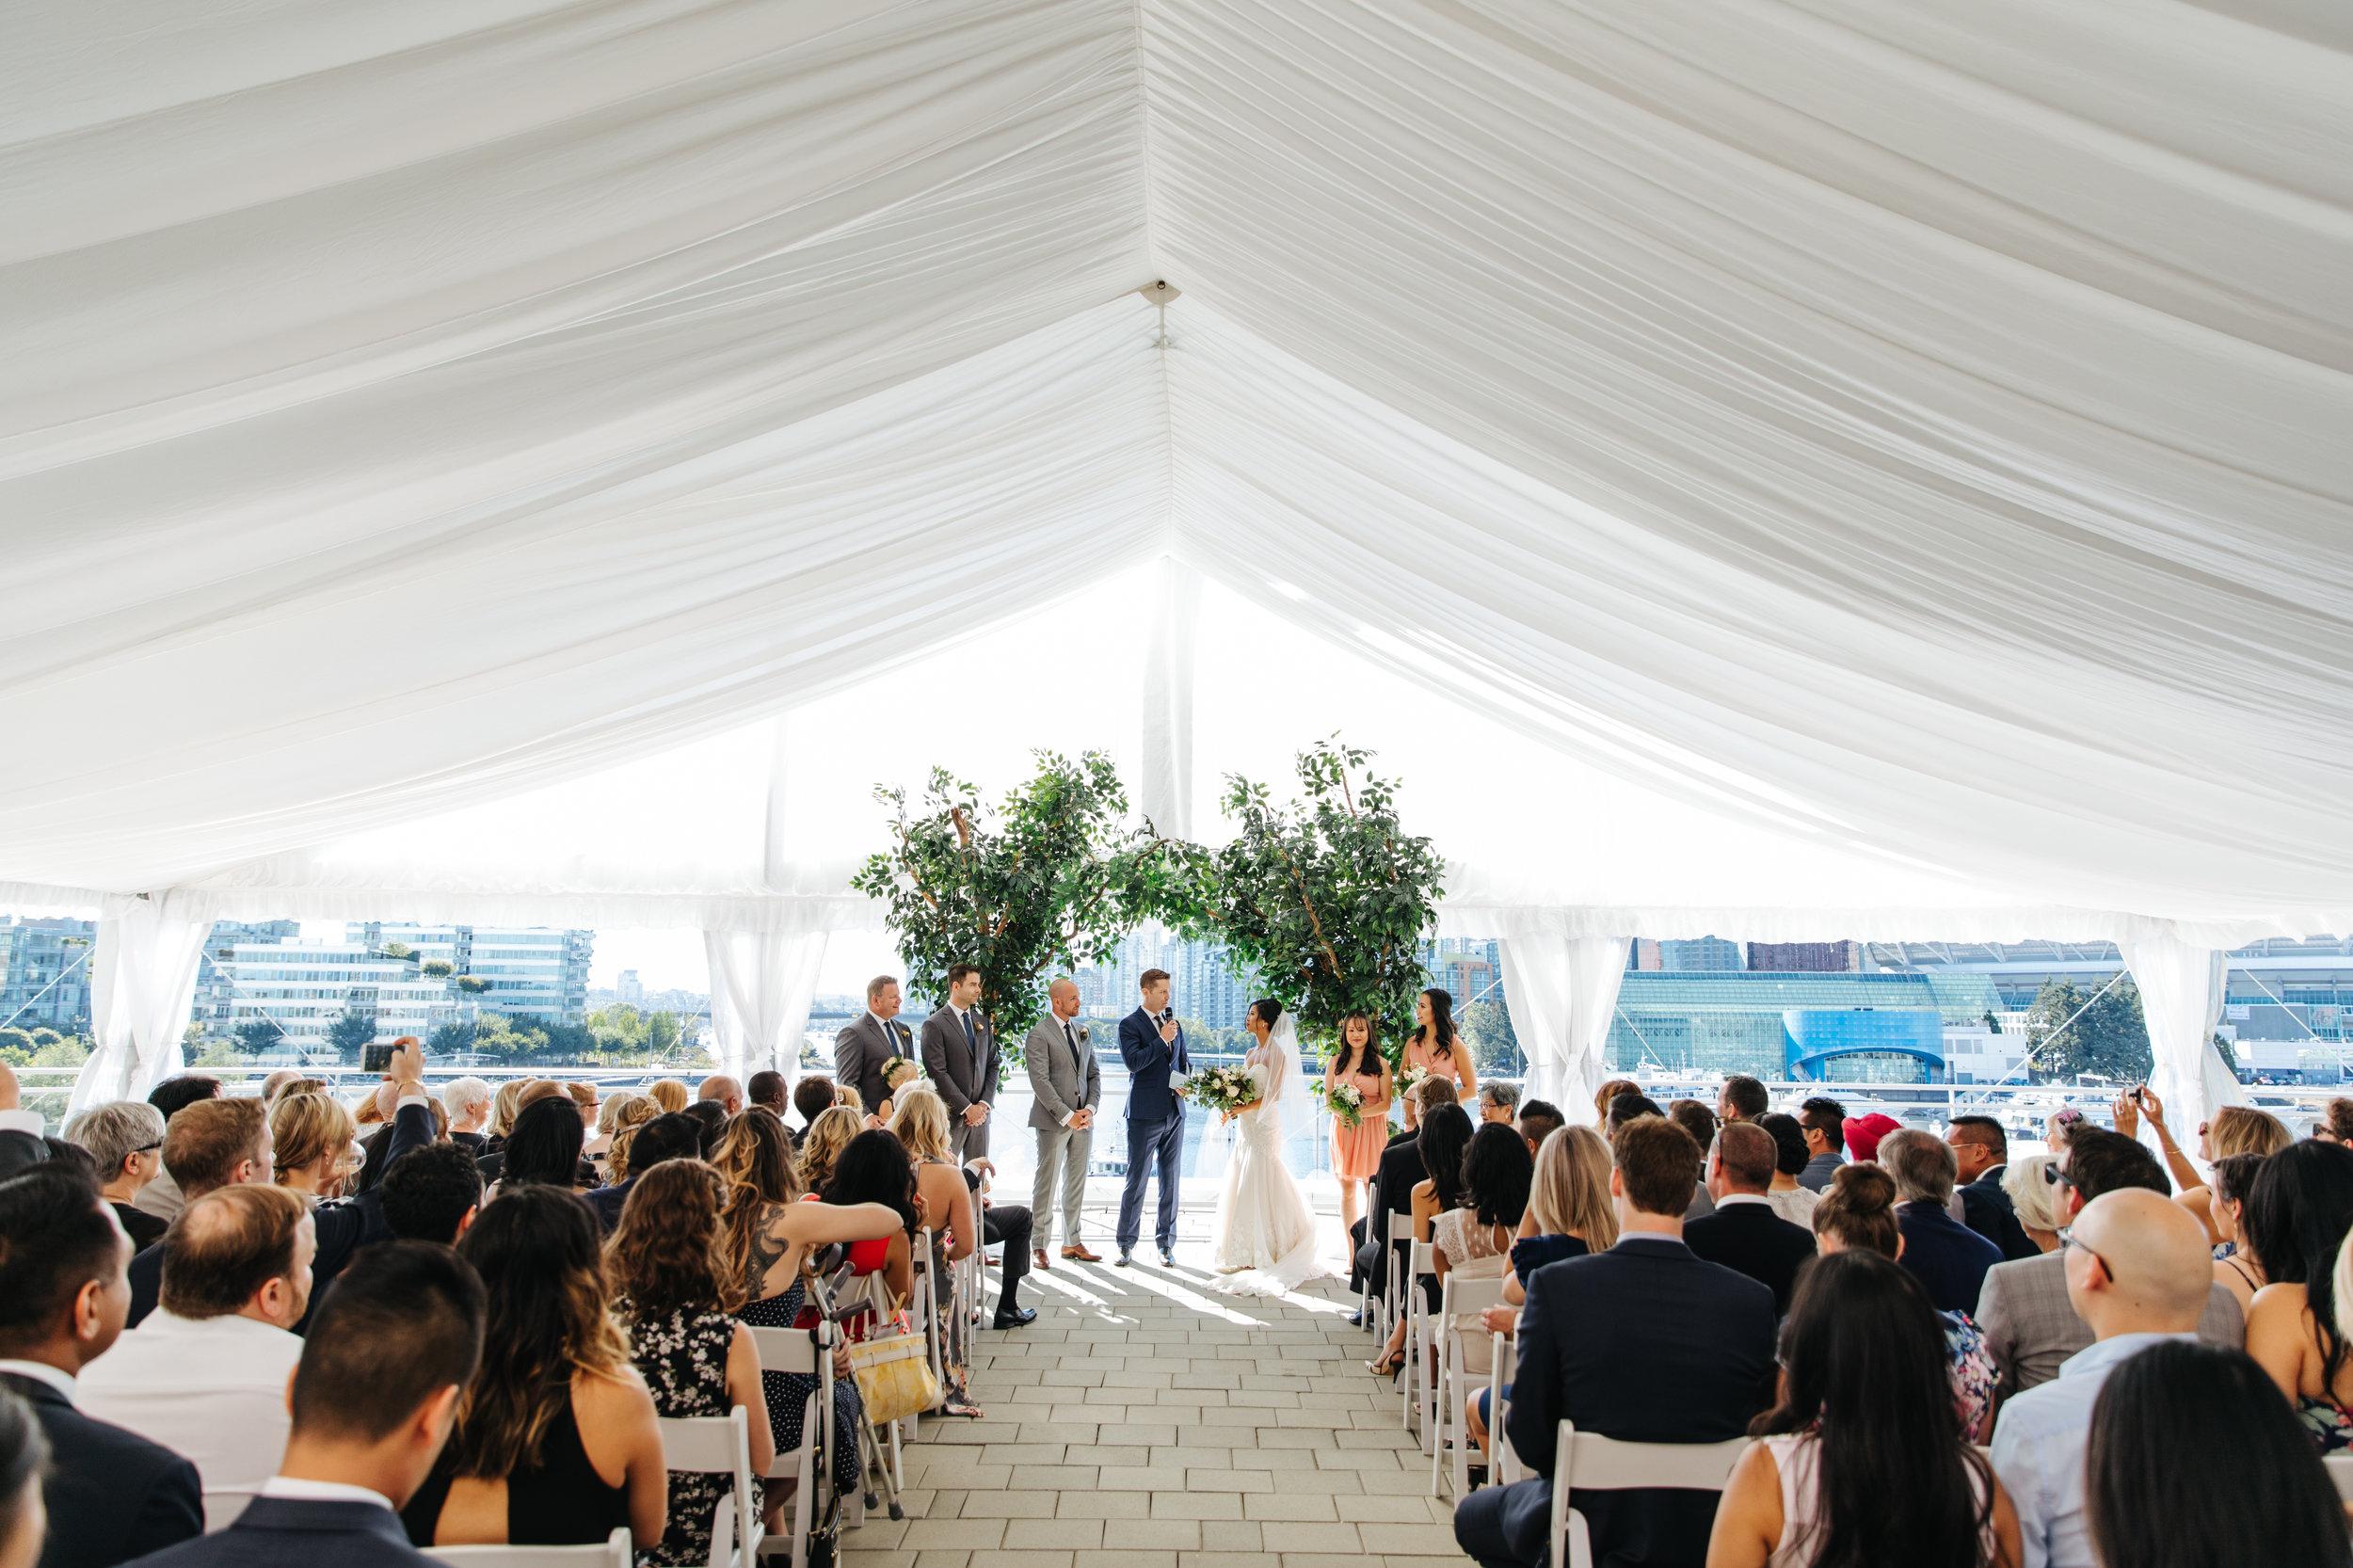 herastudios_wedding_dana_shawn_hera_selects-62.jpg